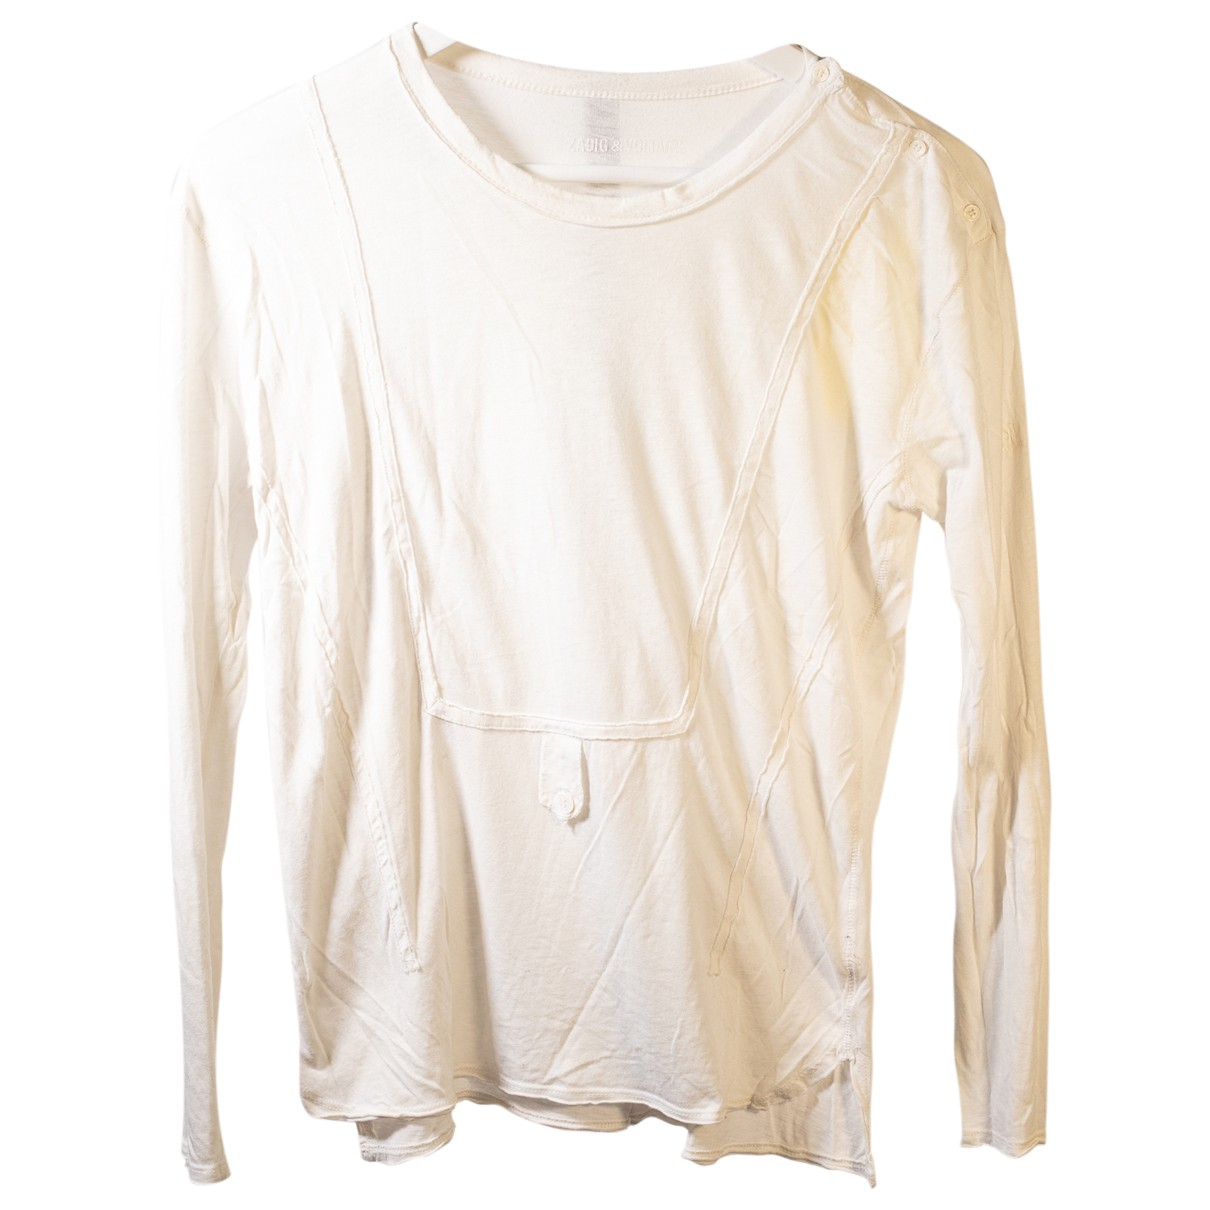 Zadig & Voltaire \N White Cotton  top for Women M International